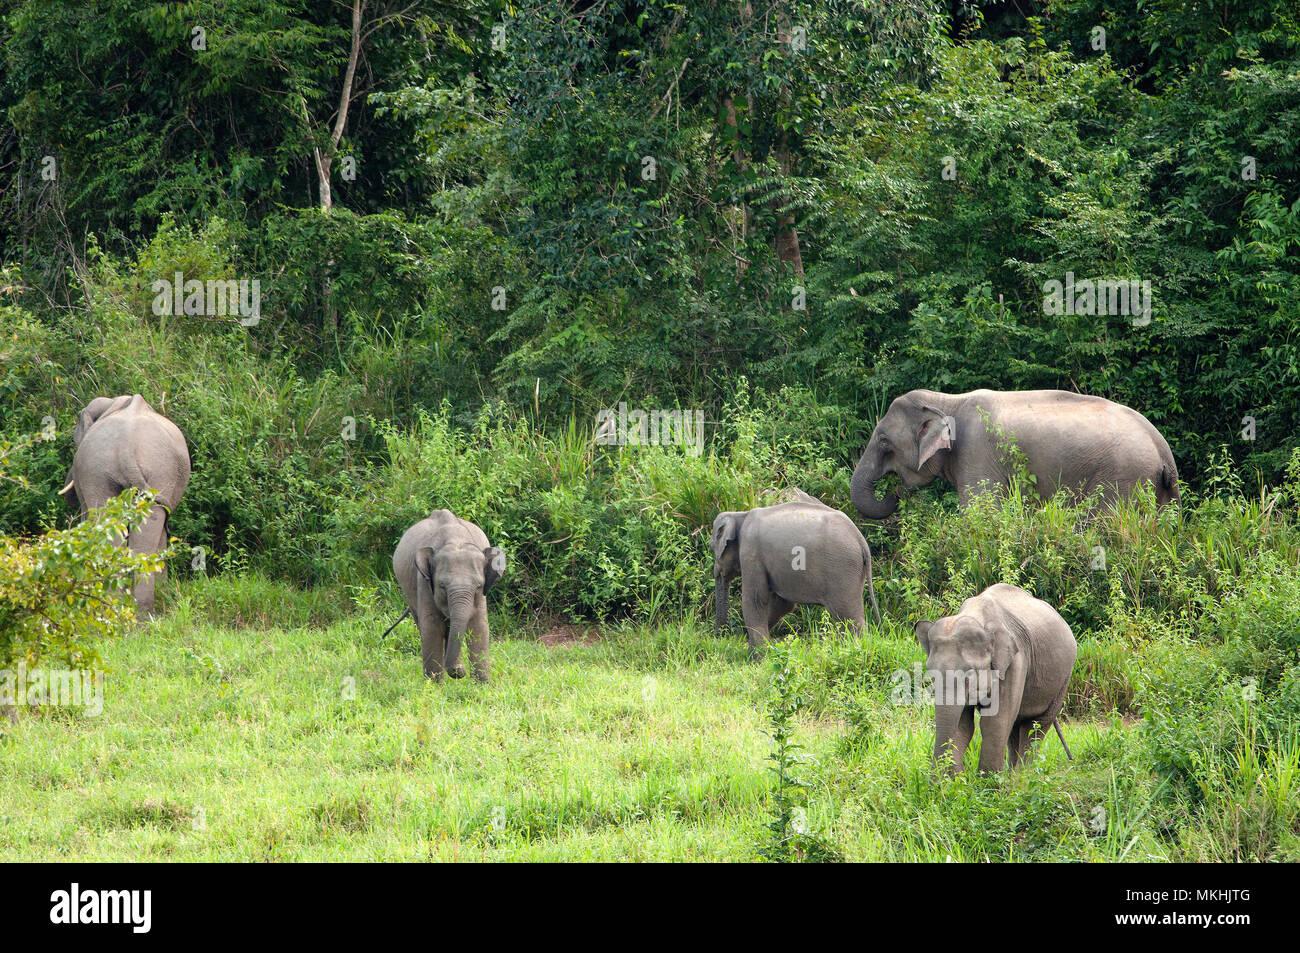 Asian Elephant (Elephas maximus) Family, Thailand - Stock Image